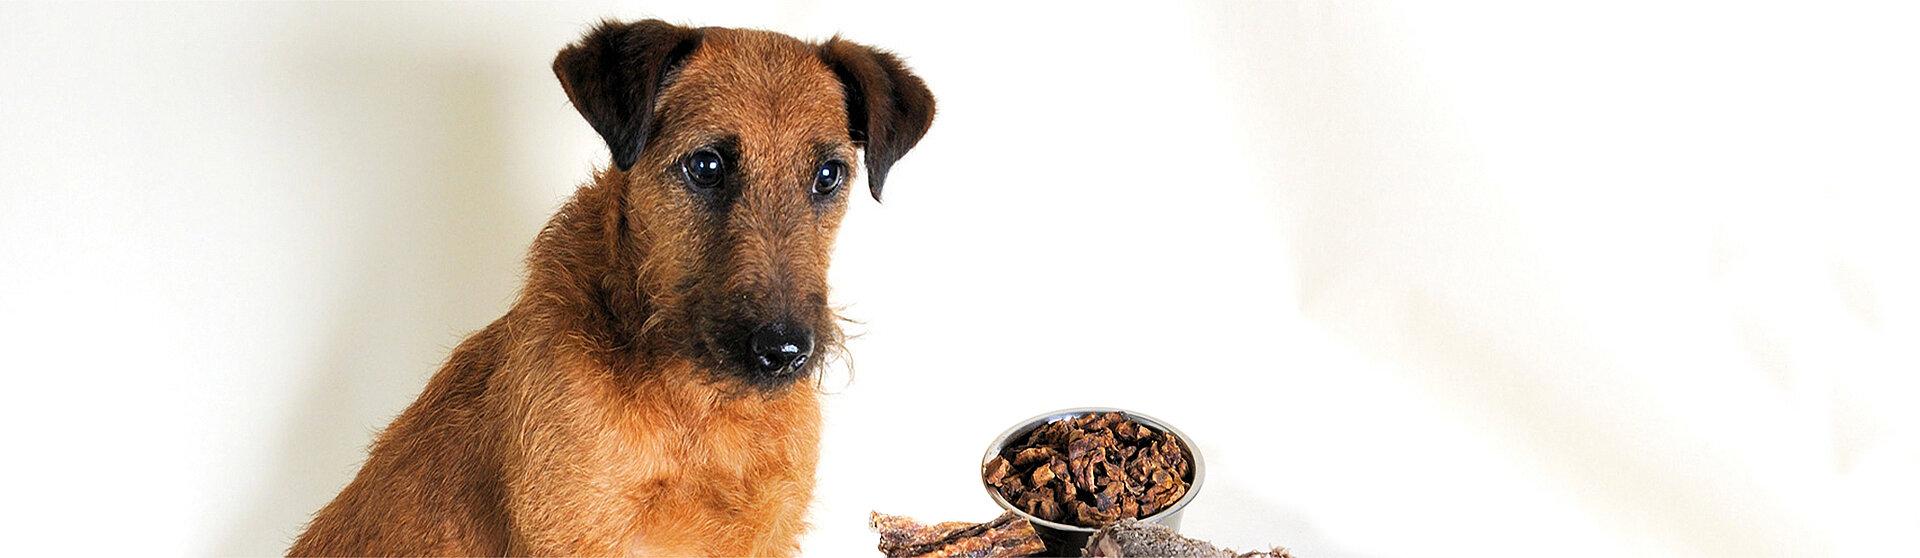 Hund mit Hundefutter.